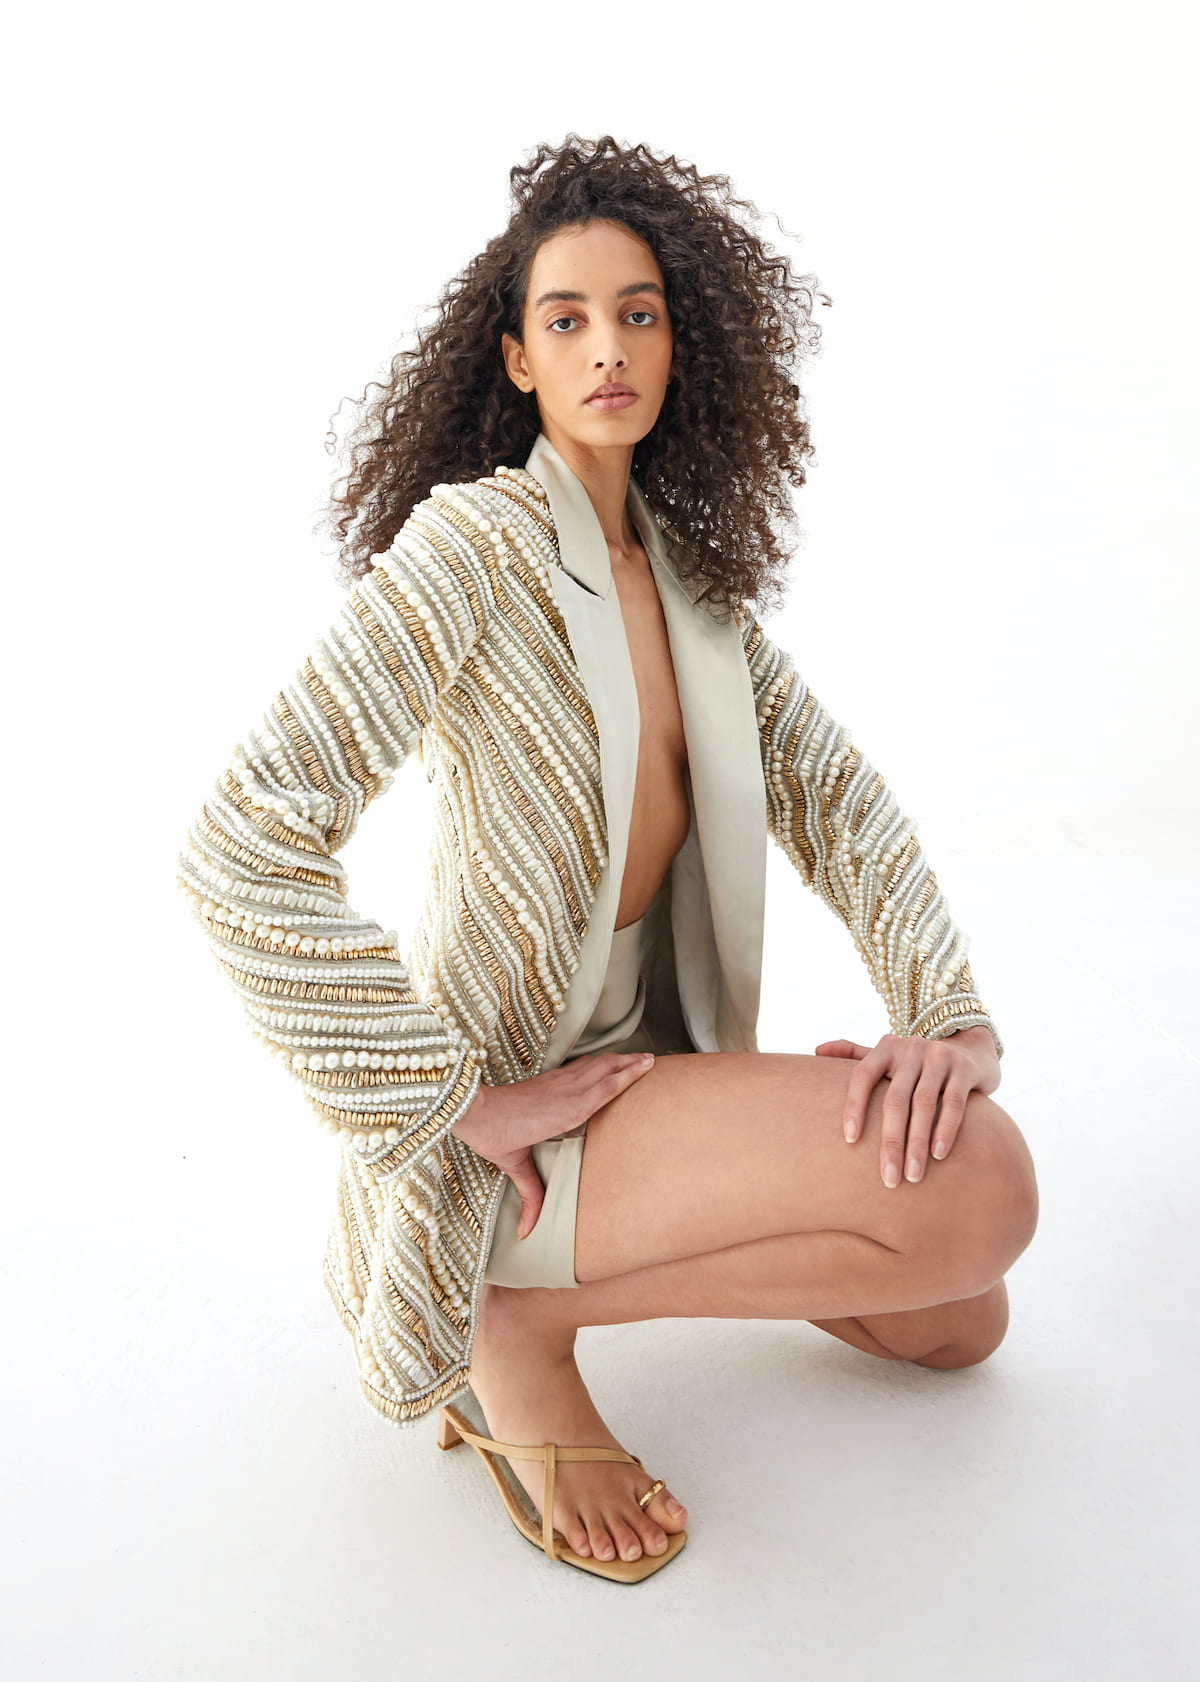 View 4 of model wearing Kasira Blazer in pearl gold.